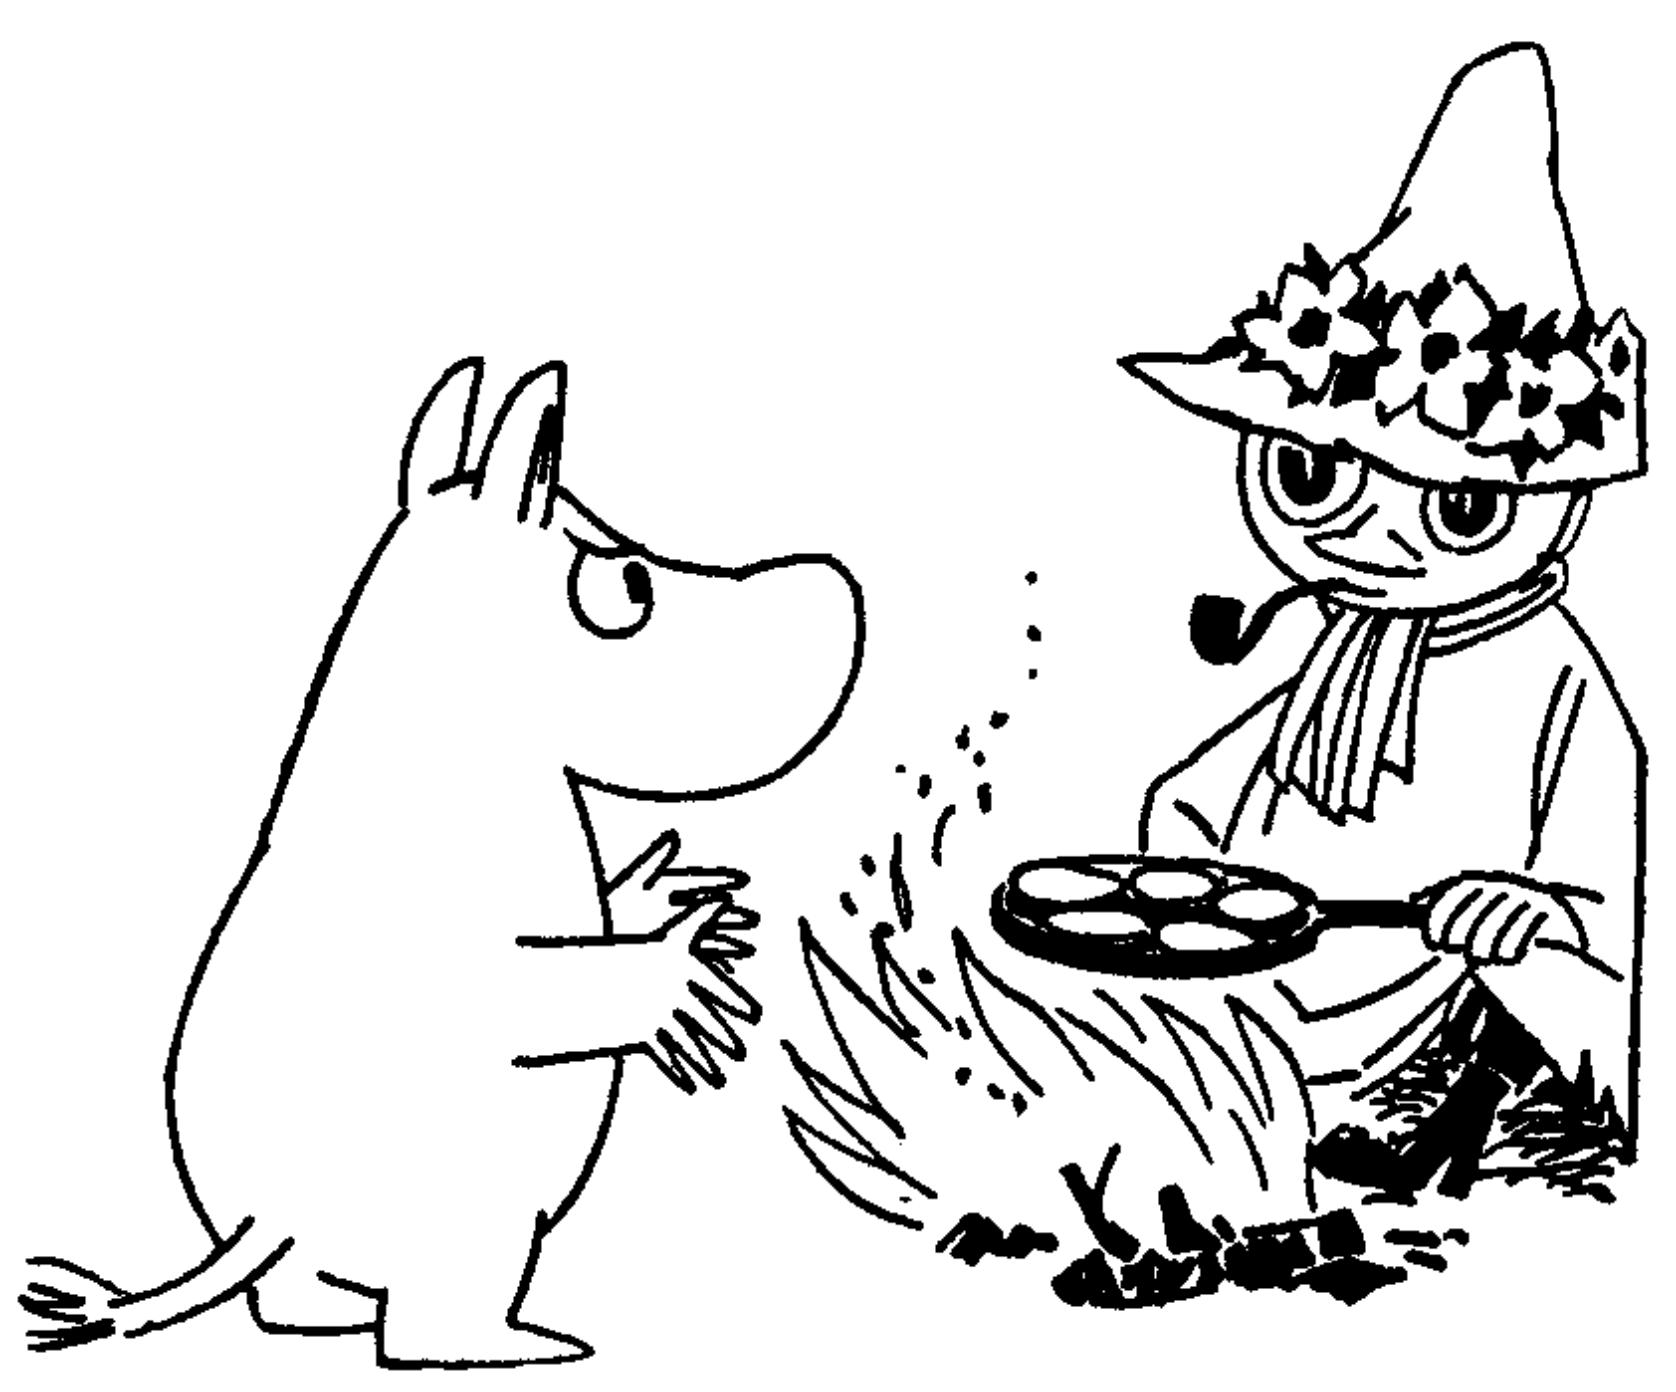 The Moomins Cook Bookby Tove Jansson and Sami Malila